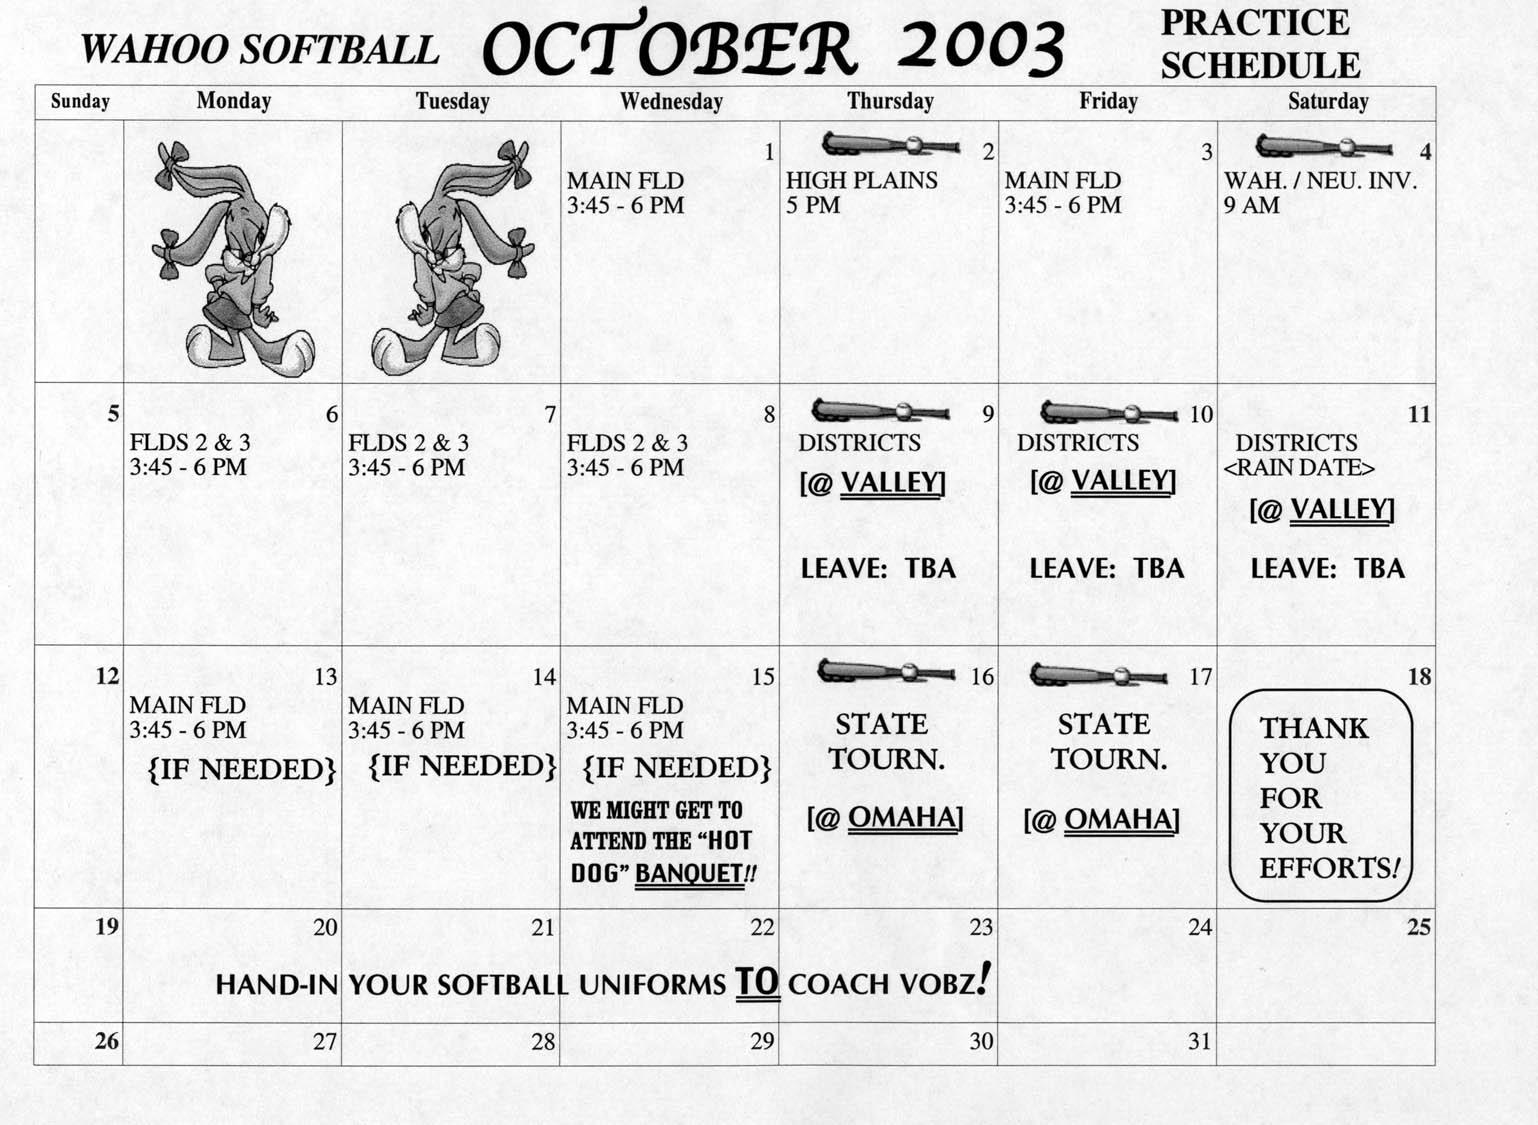 wahoo public schools girls softball practice and game schedule